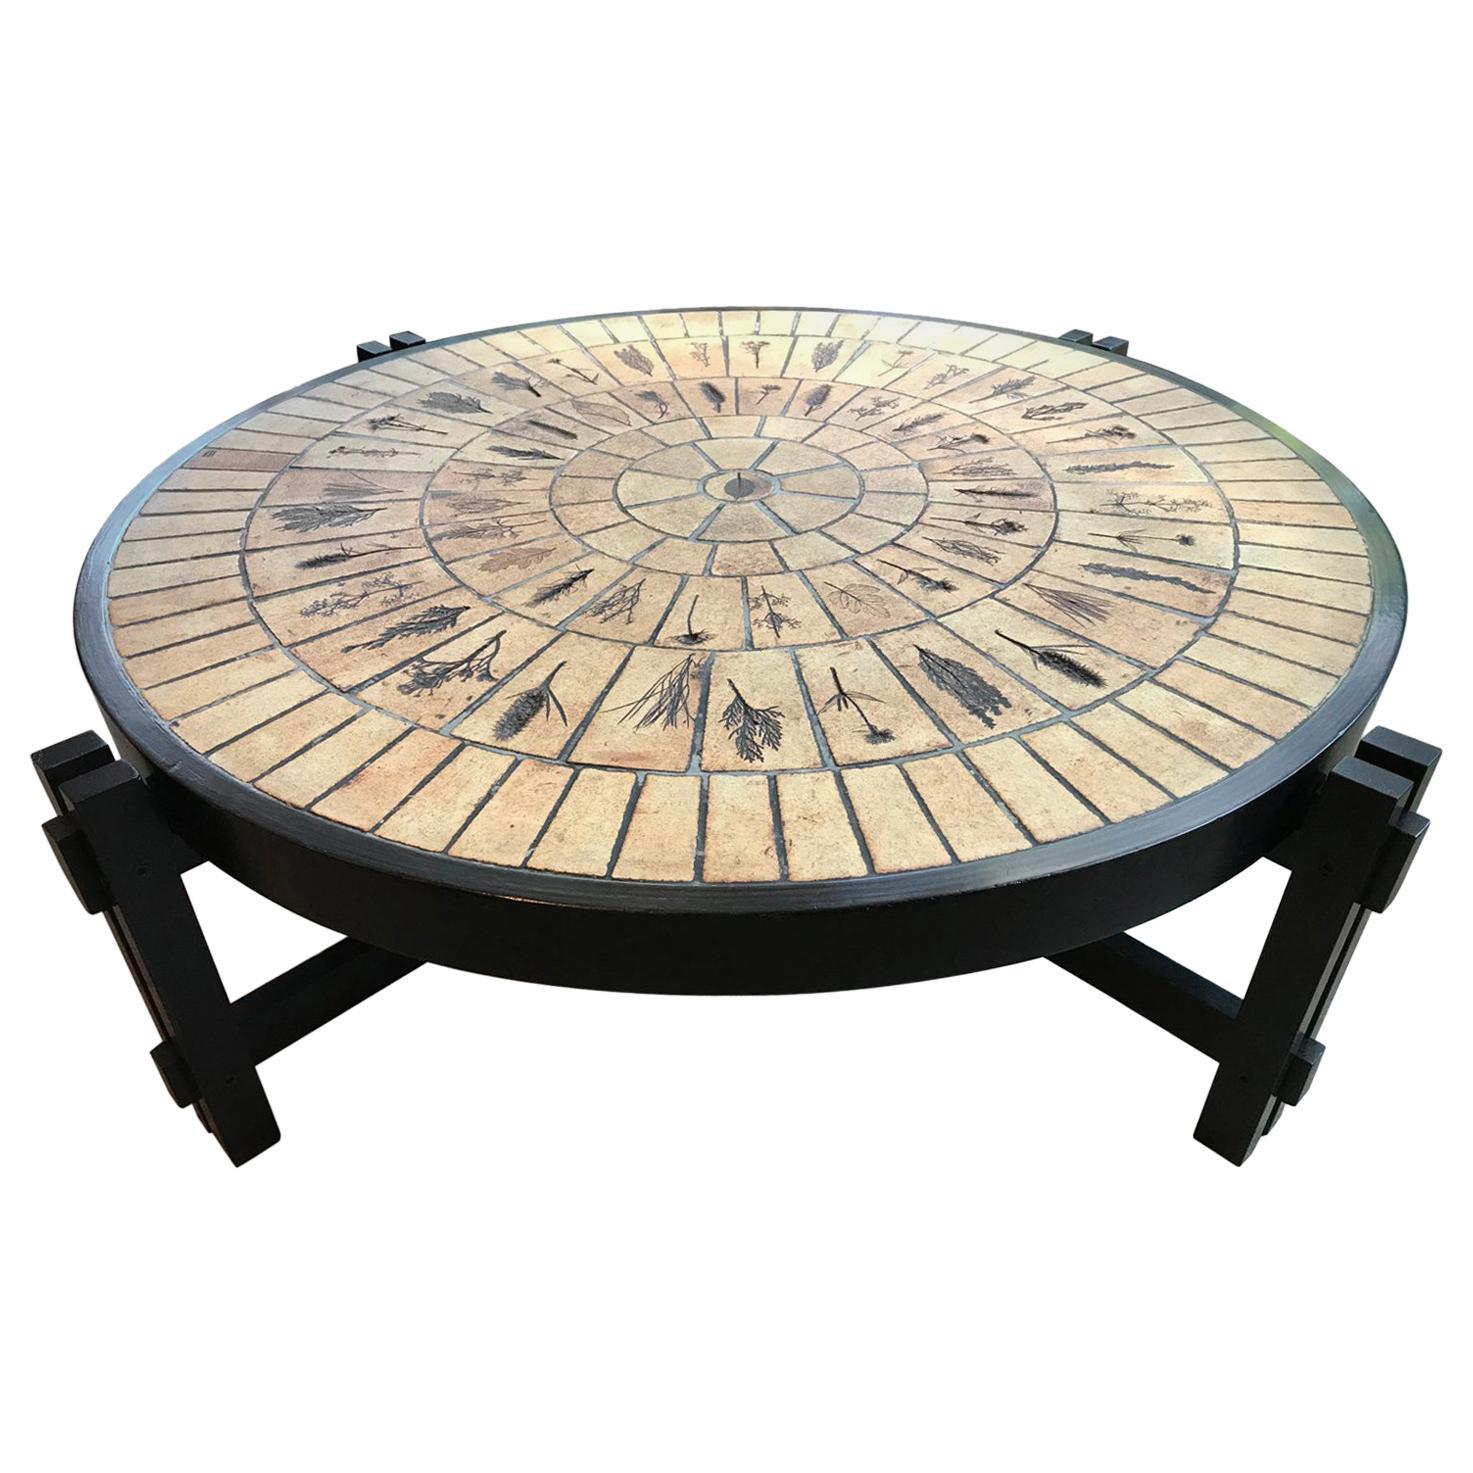 Roger Capron Center Tables